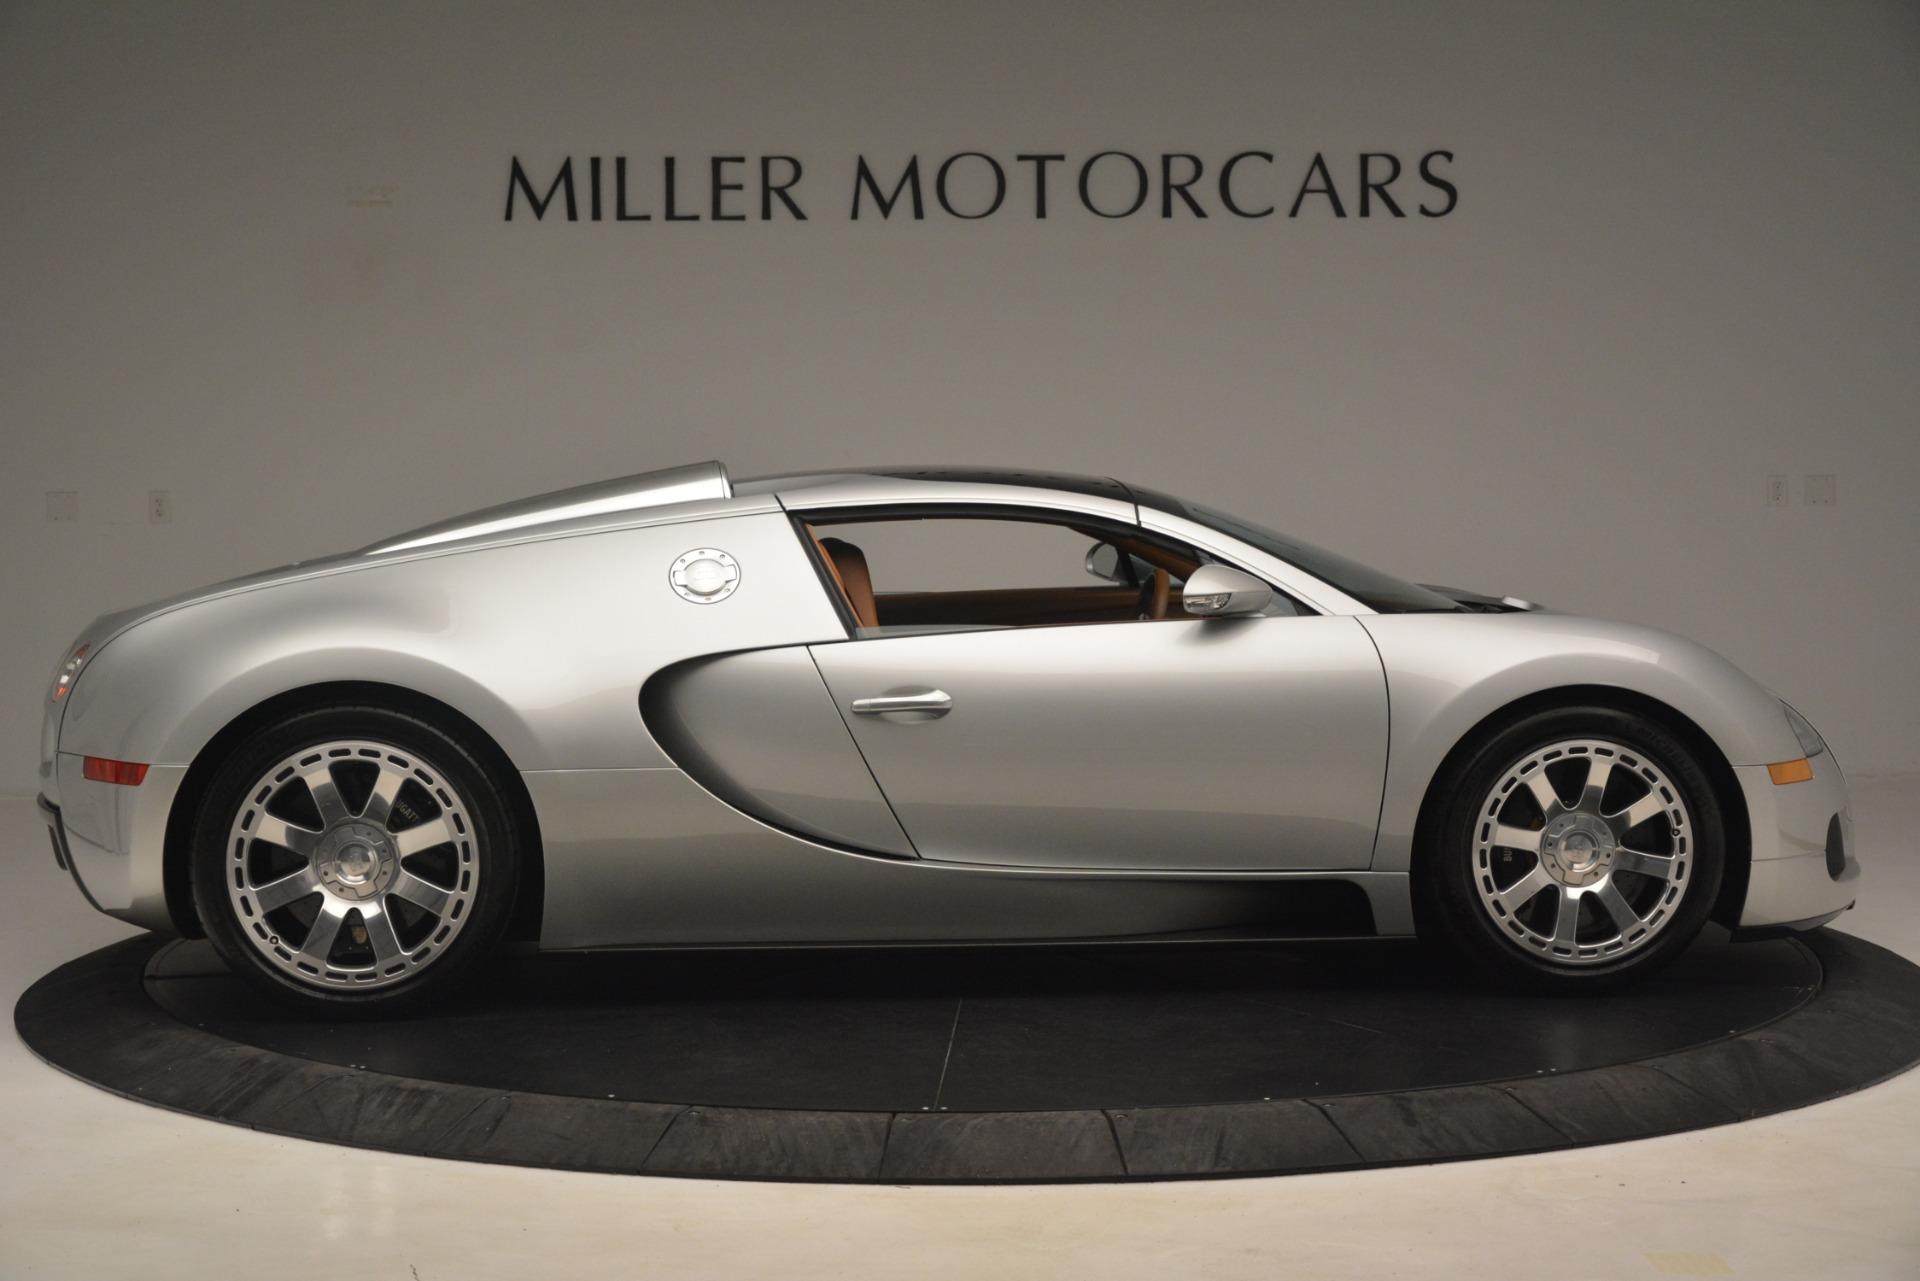 Used 2010 Bugatti Veyron 16.4 Grand Sport For Sale In Greenwich, CT 3159_p19